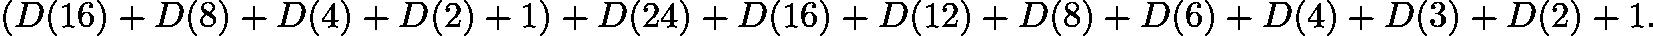 $(D(16)+D(8)+D(4)+D(2)+1)+D(24)+D(16)+D(12)+D(8)+D(6)+D(4)+D(3)+D(2)+1.$